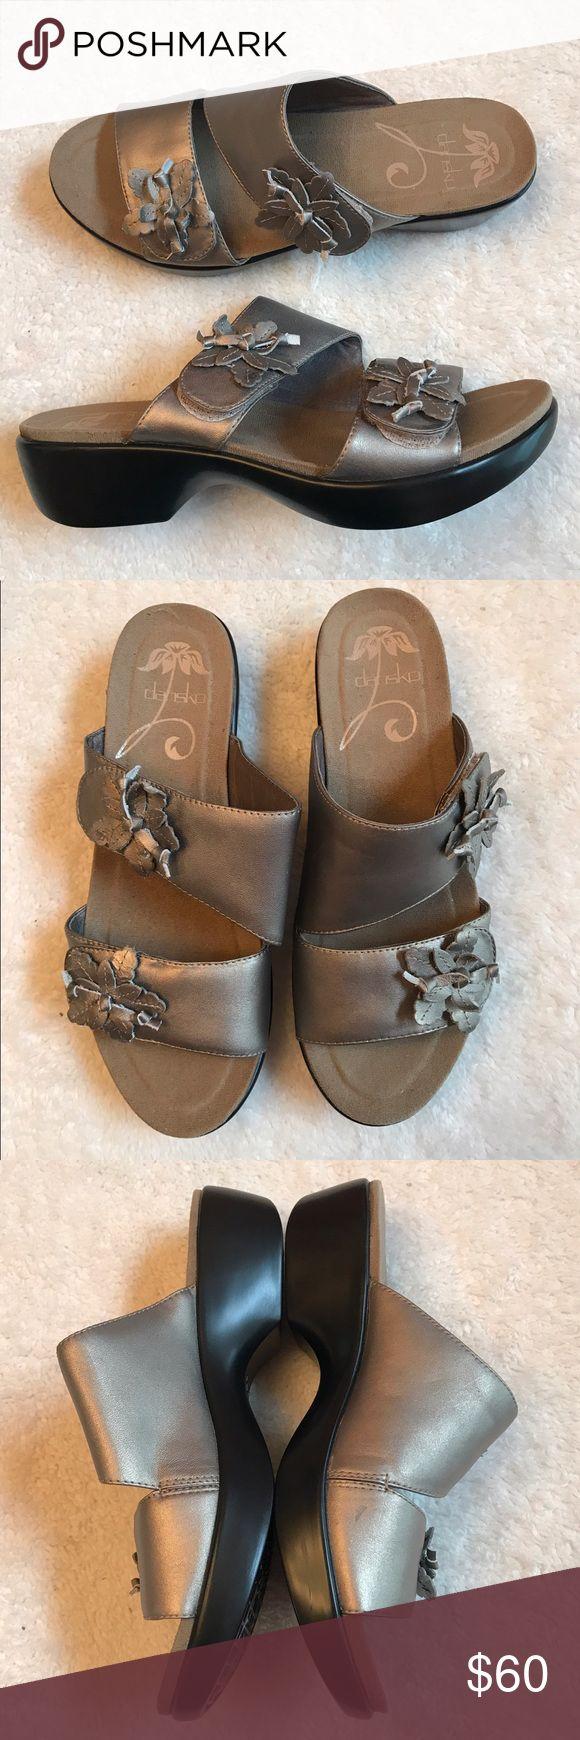 Dansko pewter sandals Like new condition. Velcro adjustable straps. Size 37 Dansko Shoes Sandals